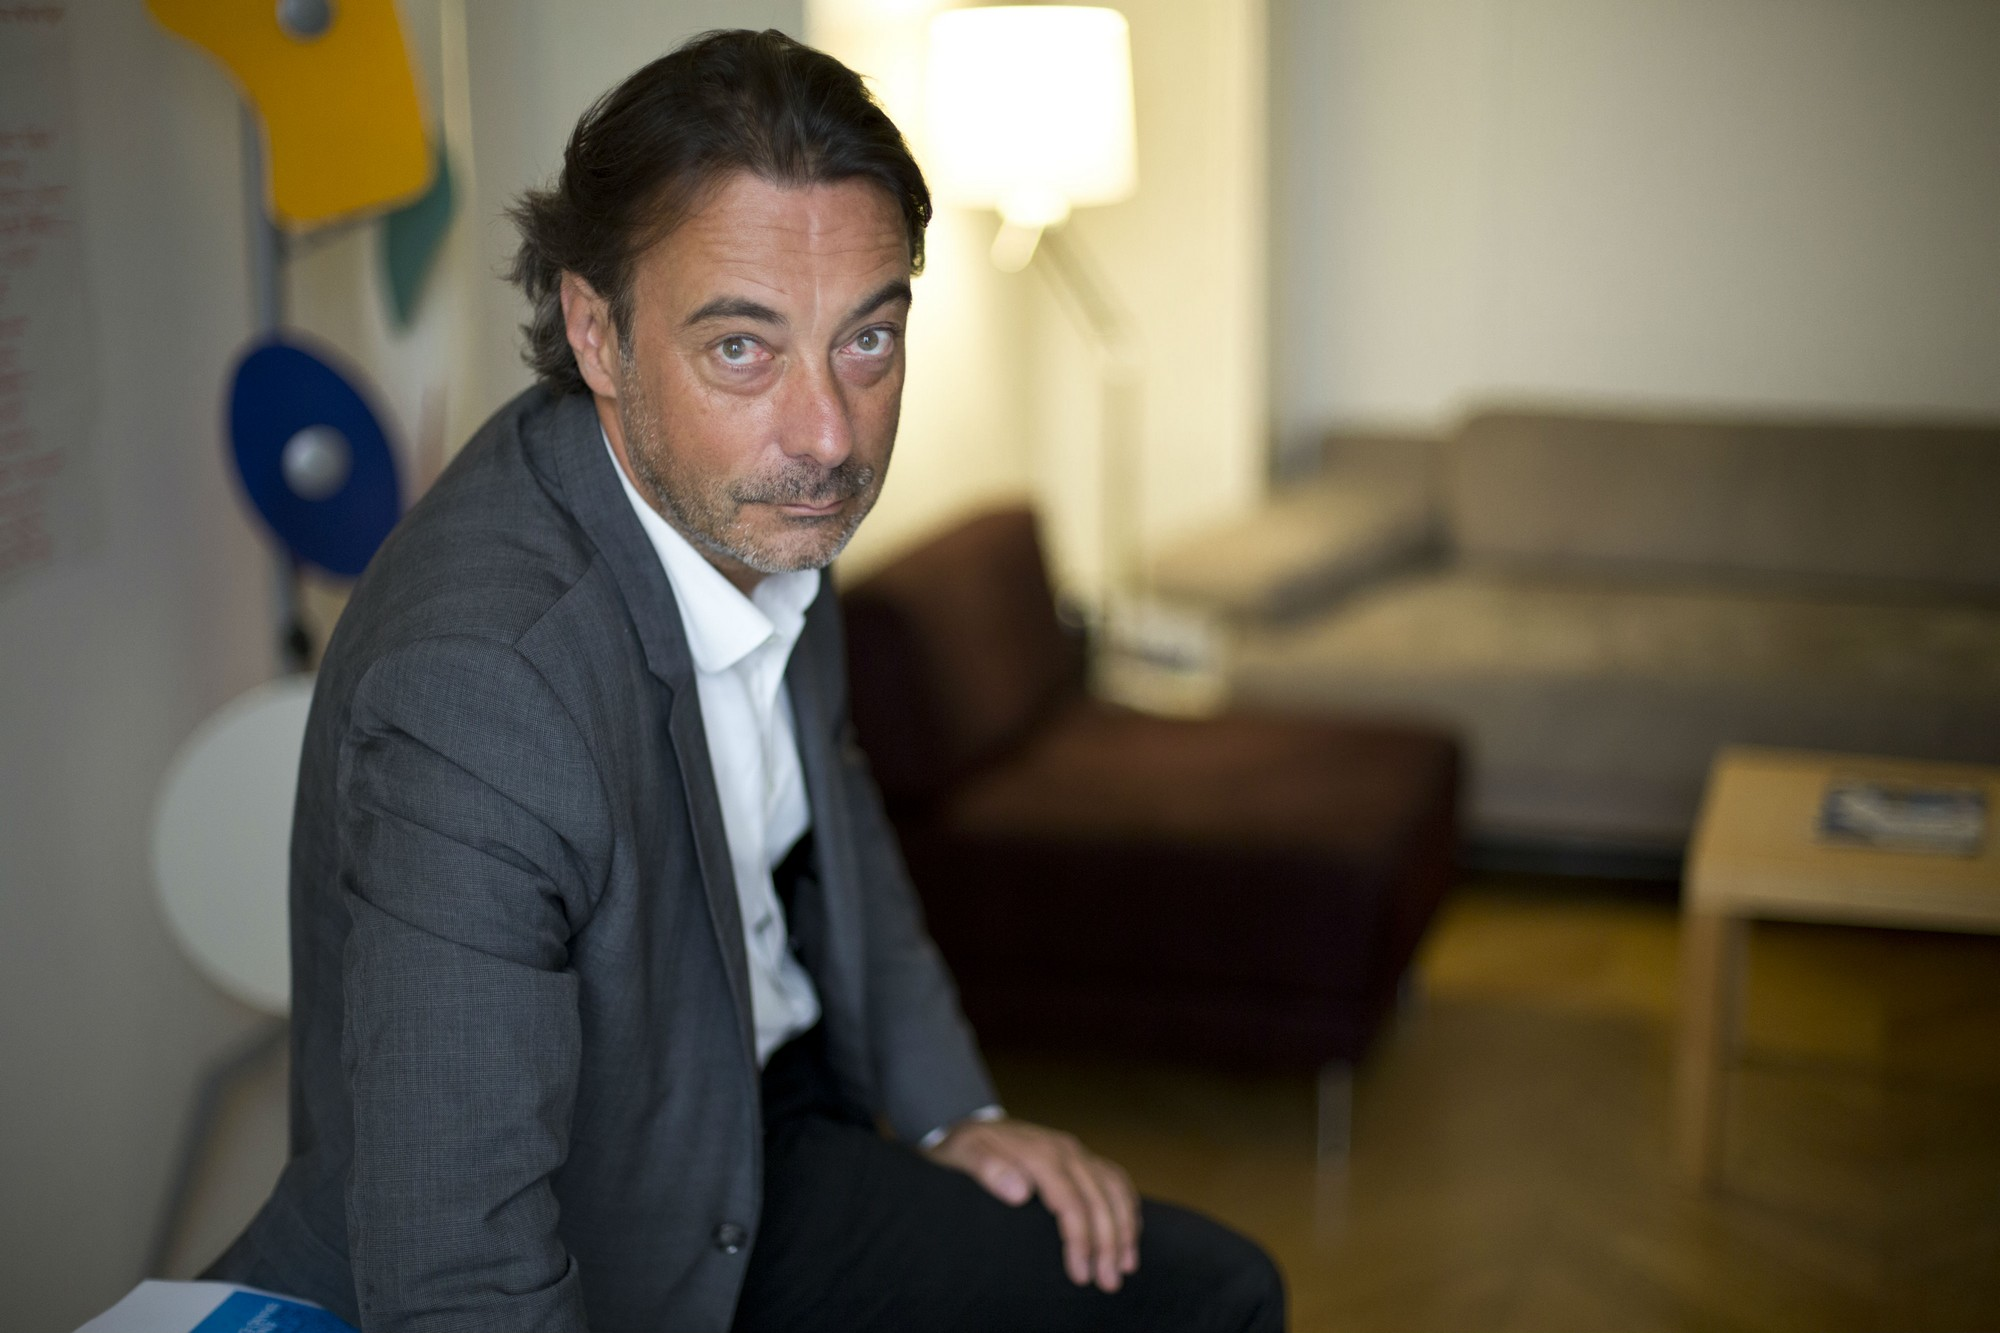 Stéphane Ricou, Brand Union